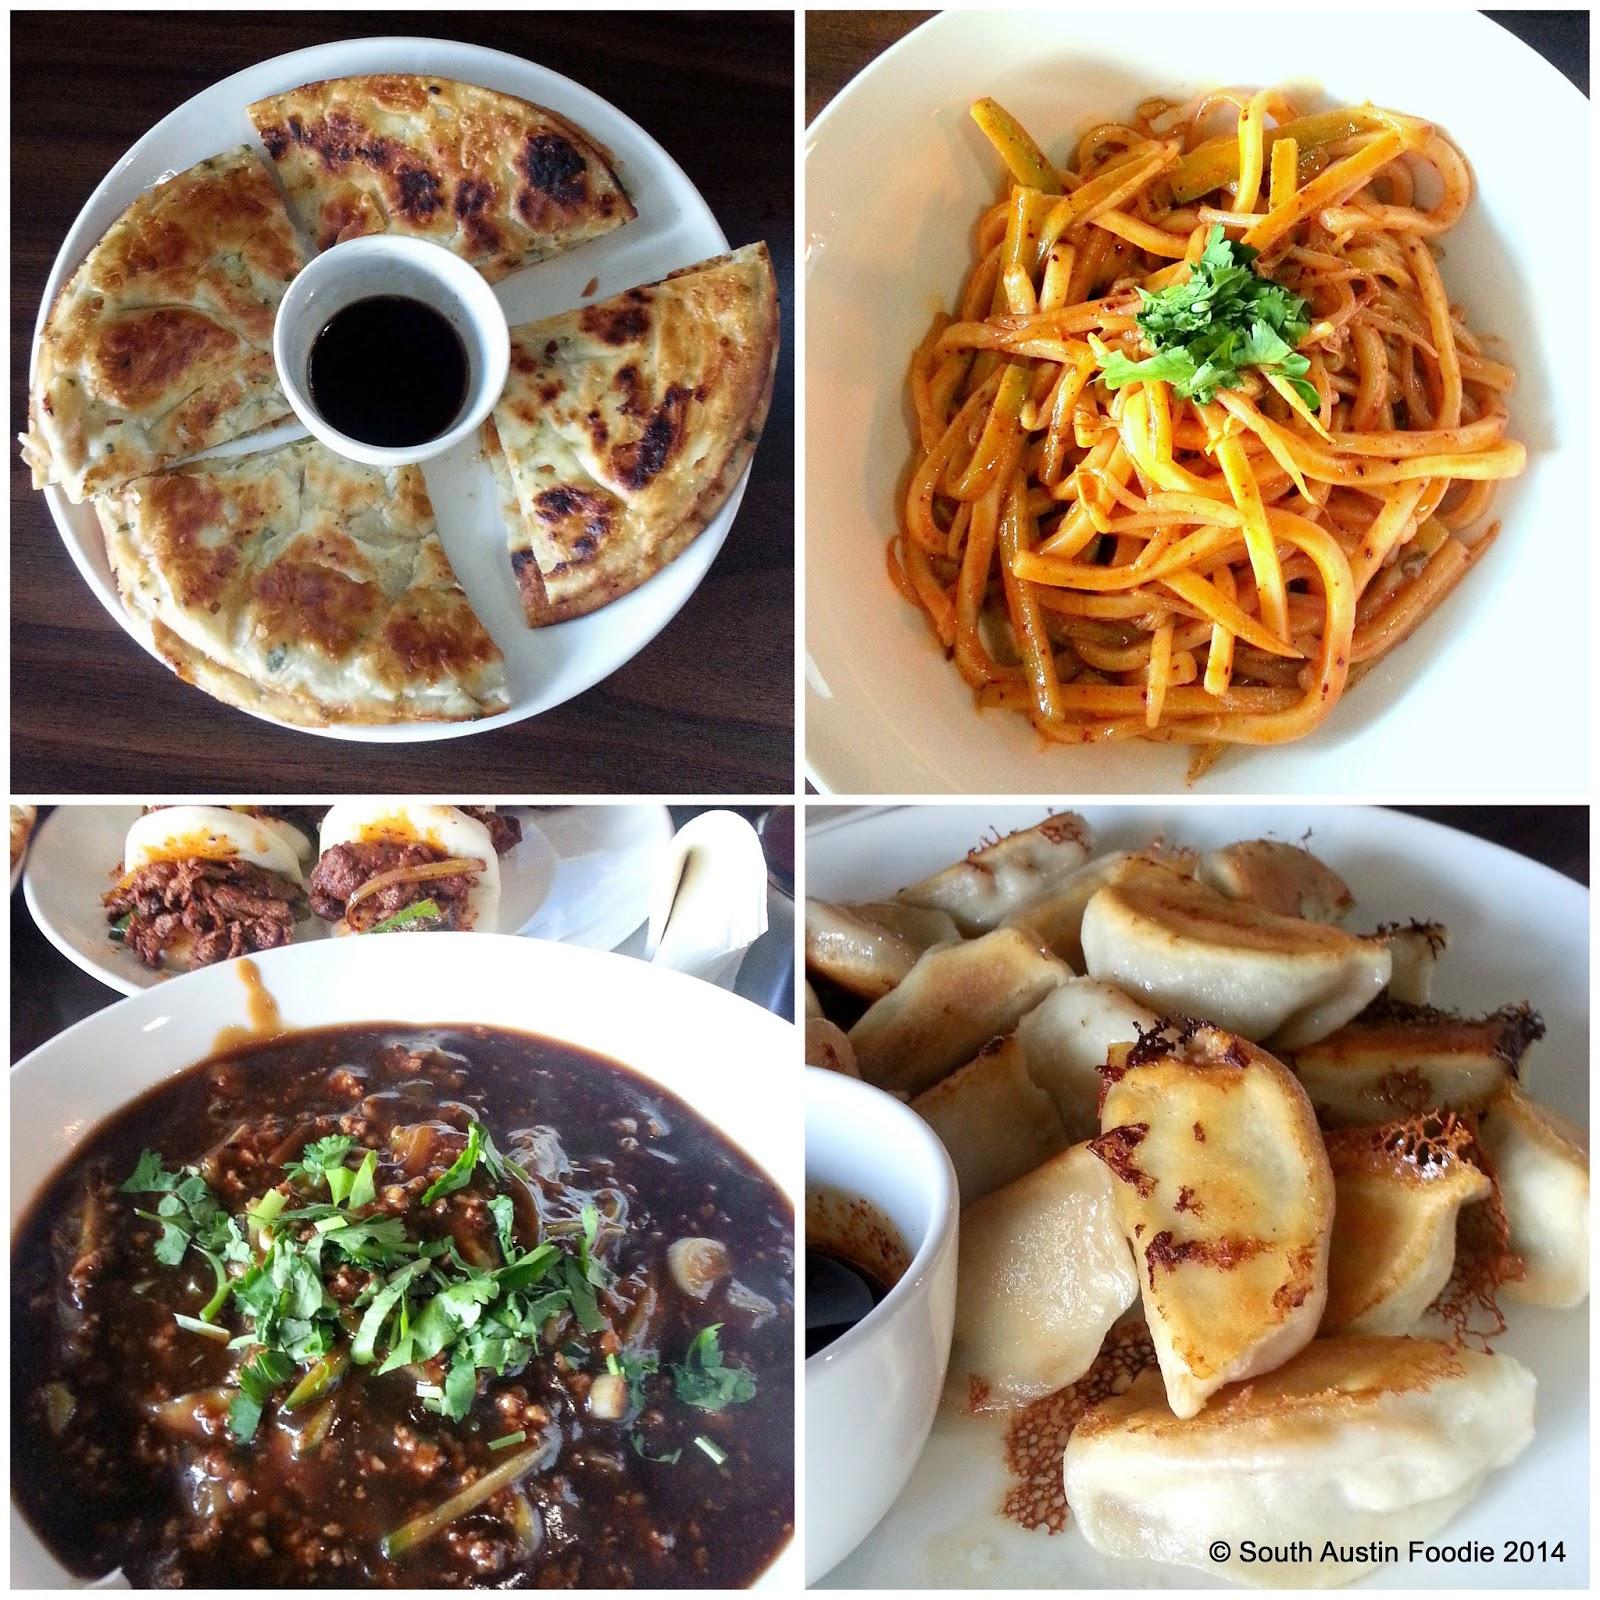 Chen Z -- green onion pancake, hand cut noodles, dumplings